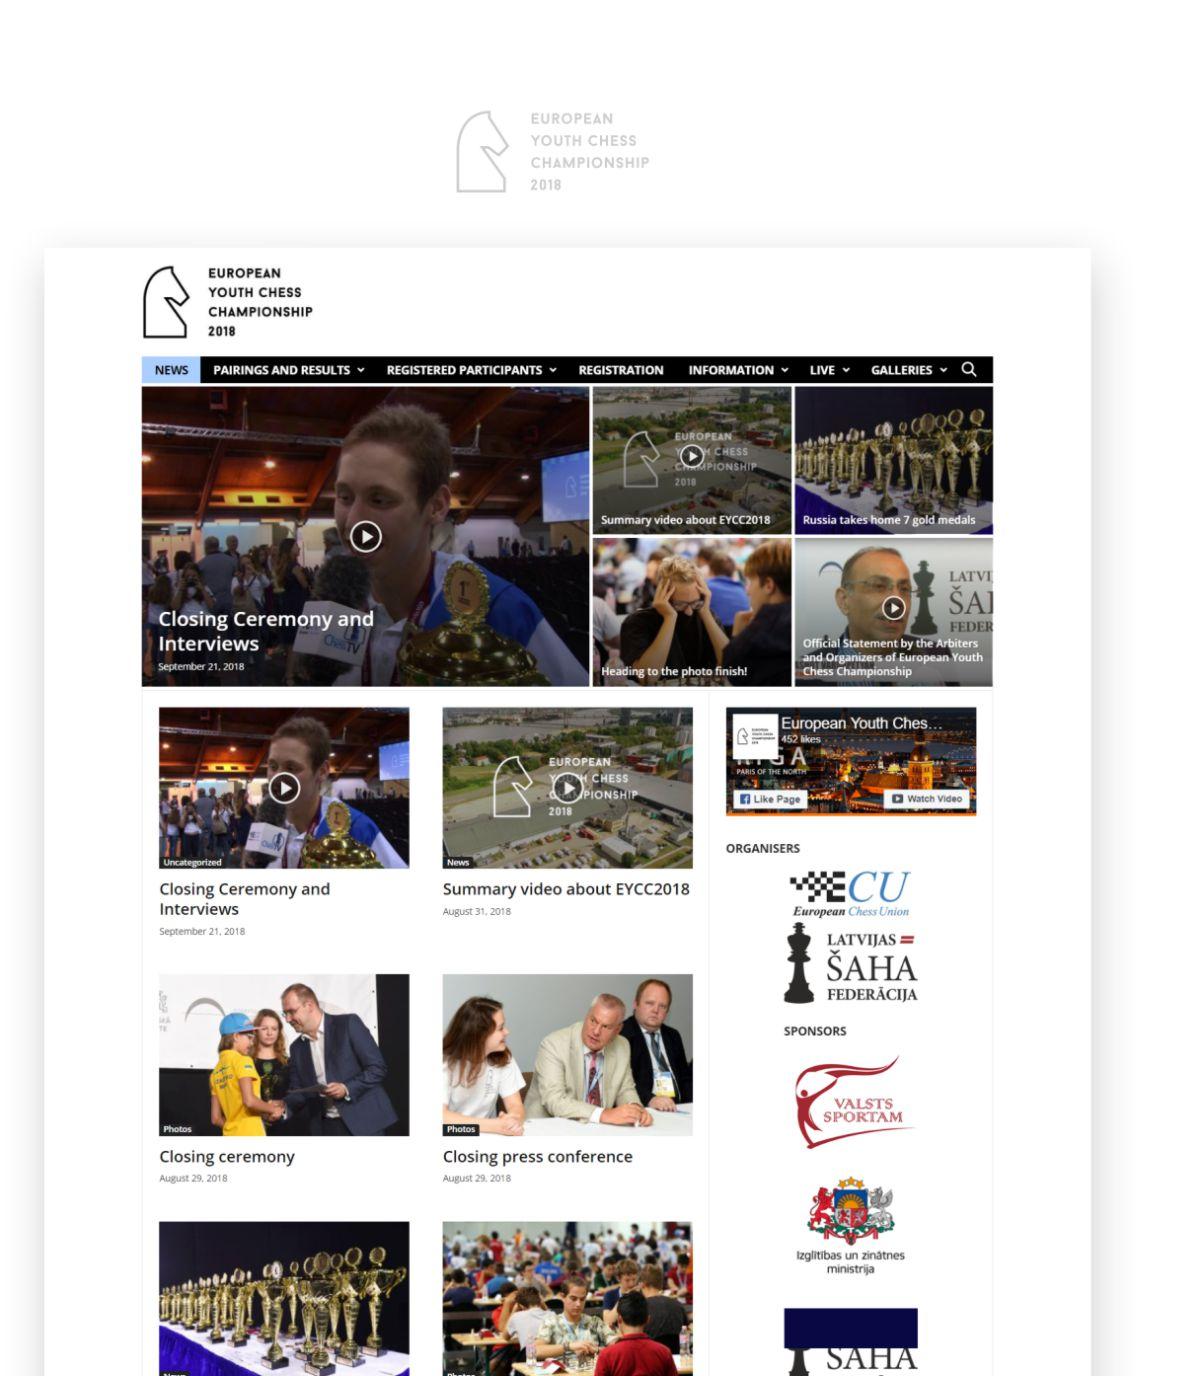 European Youth Chess Championship 2018 website design - portfolio